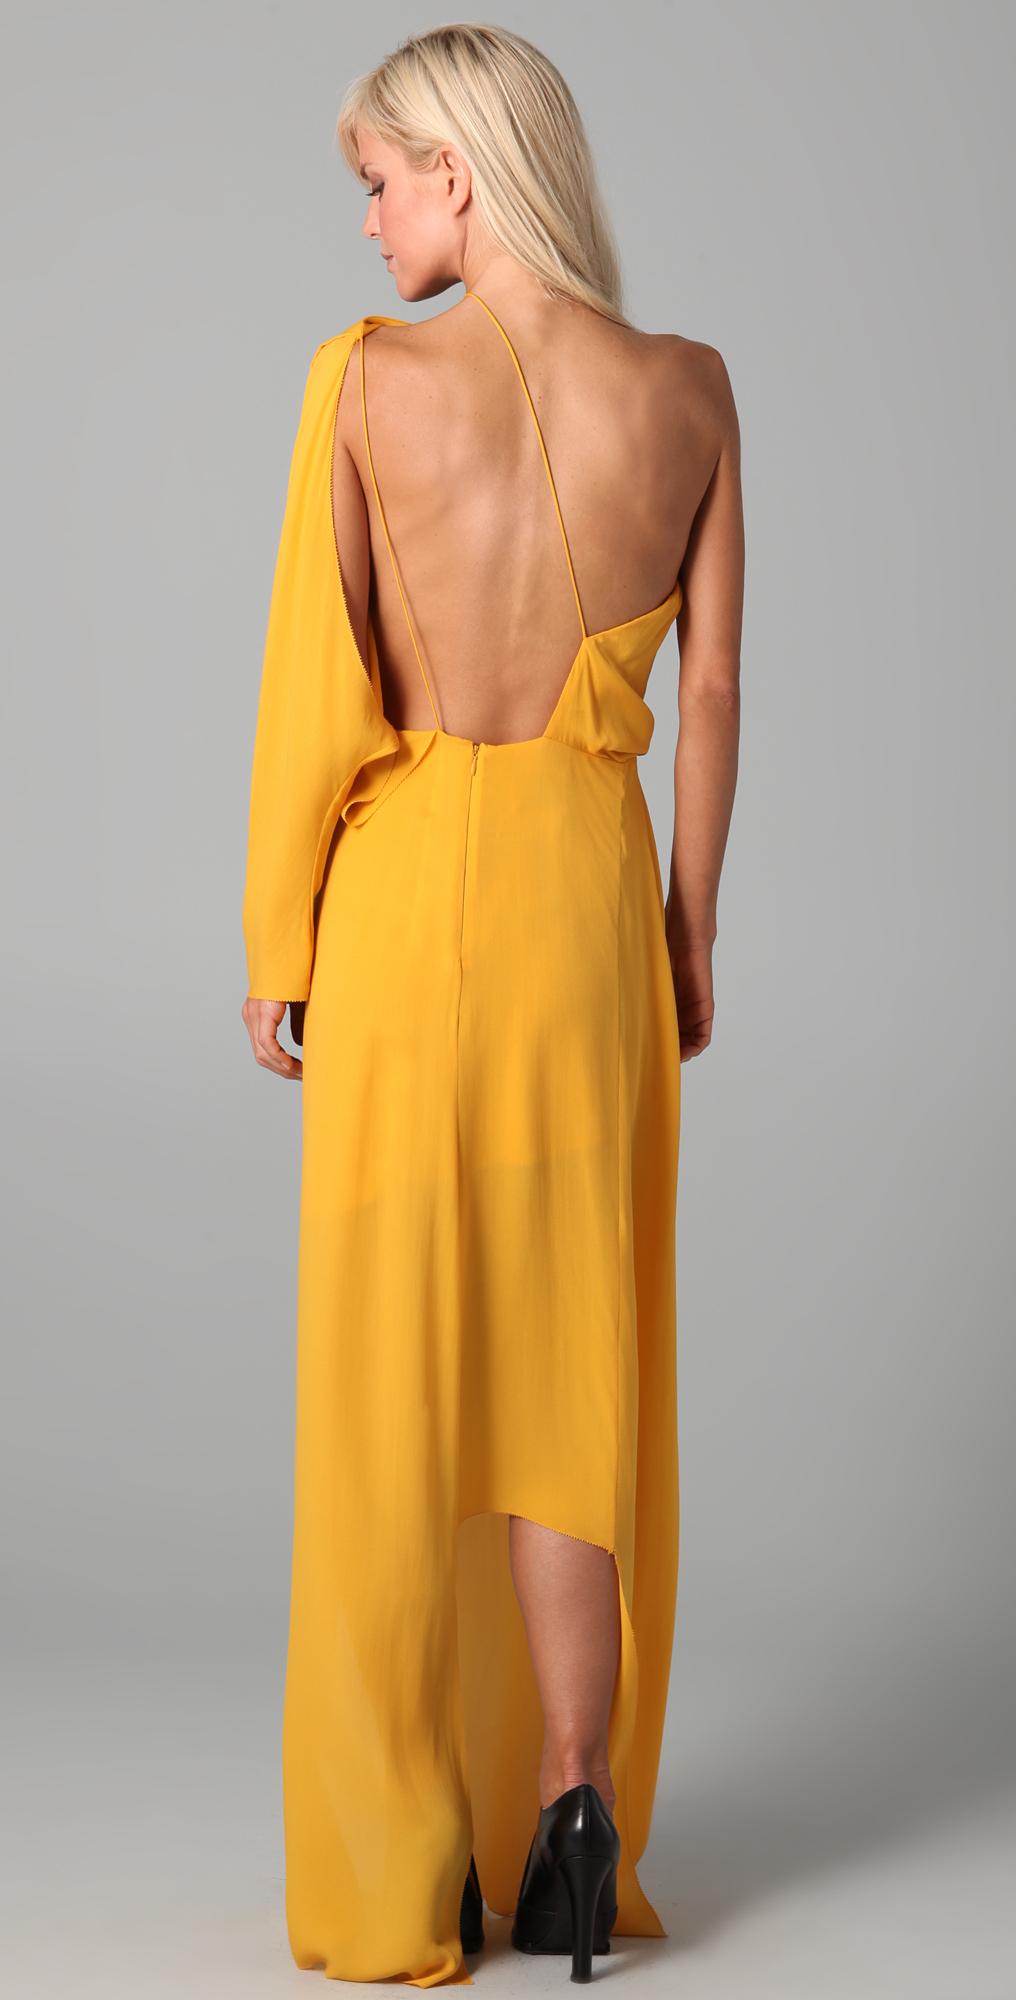 Kim kamperman yellow dress retail